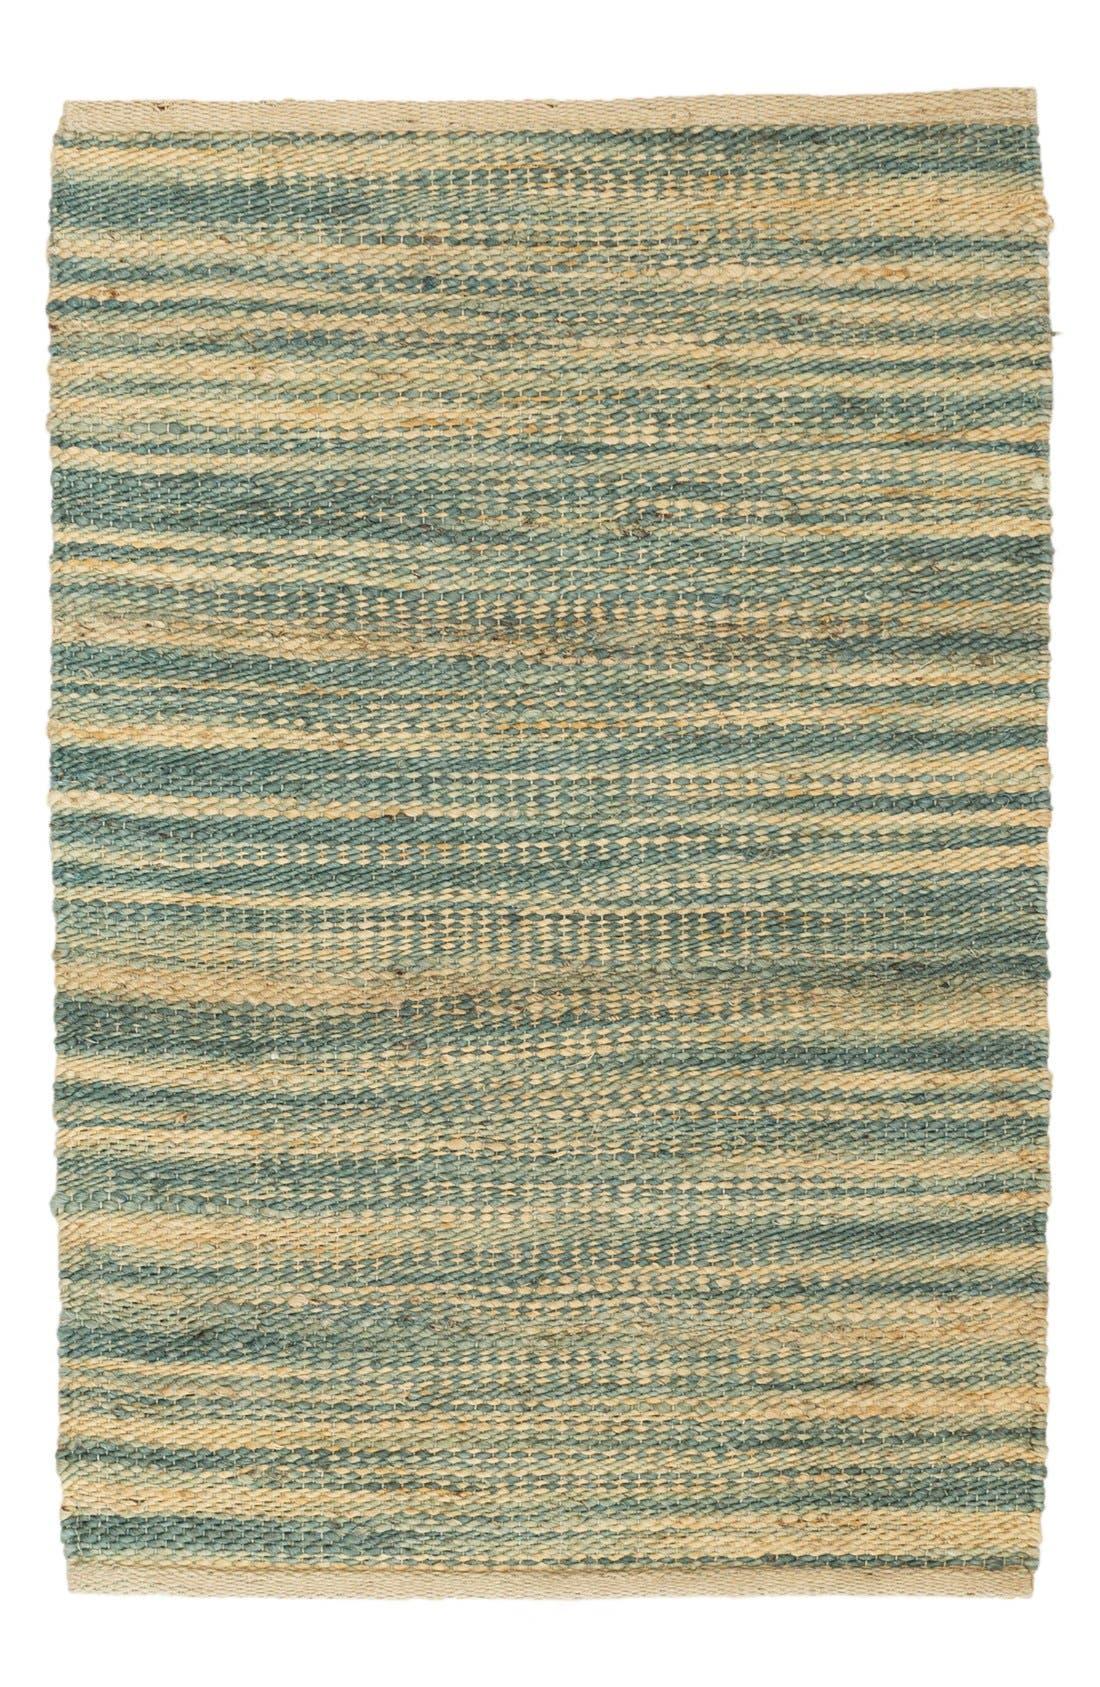 Haze Handwoven Rug,                         Main,                         color, BLUE